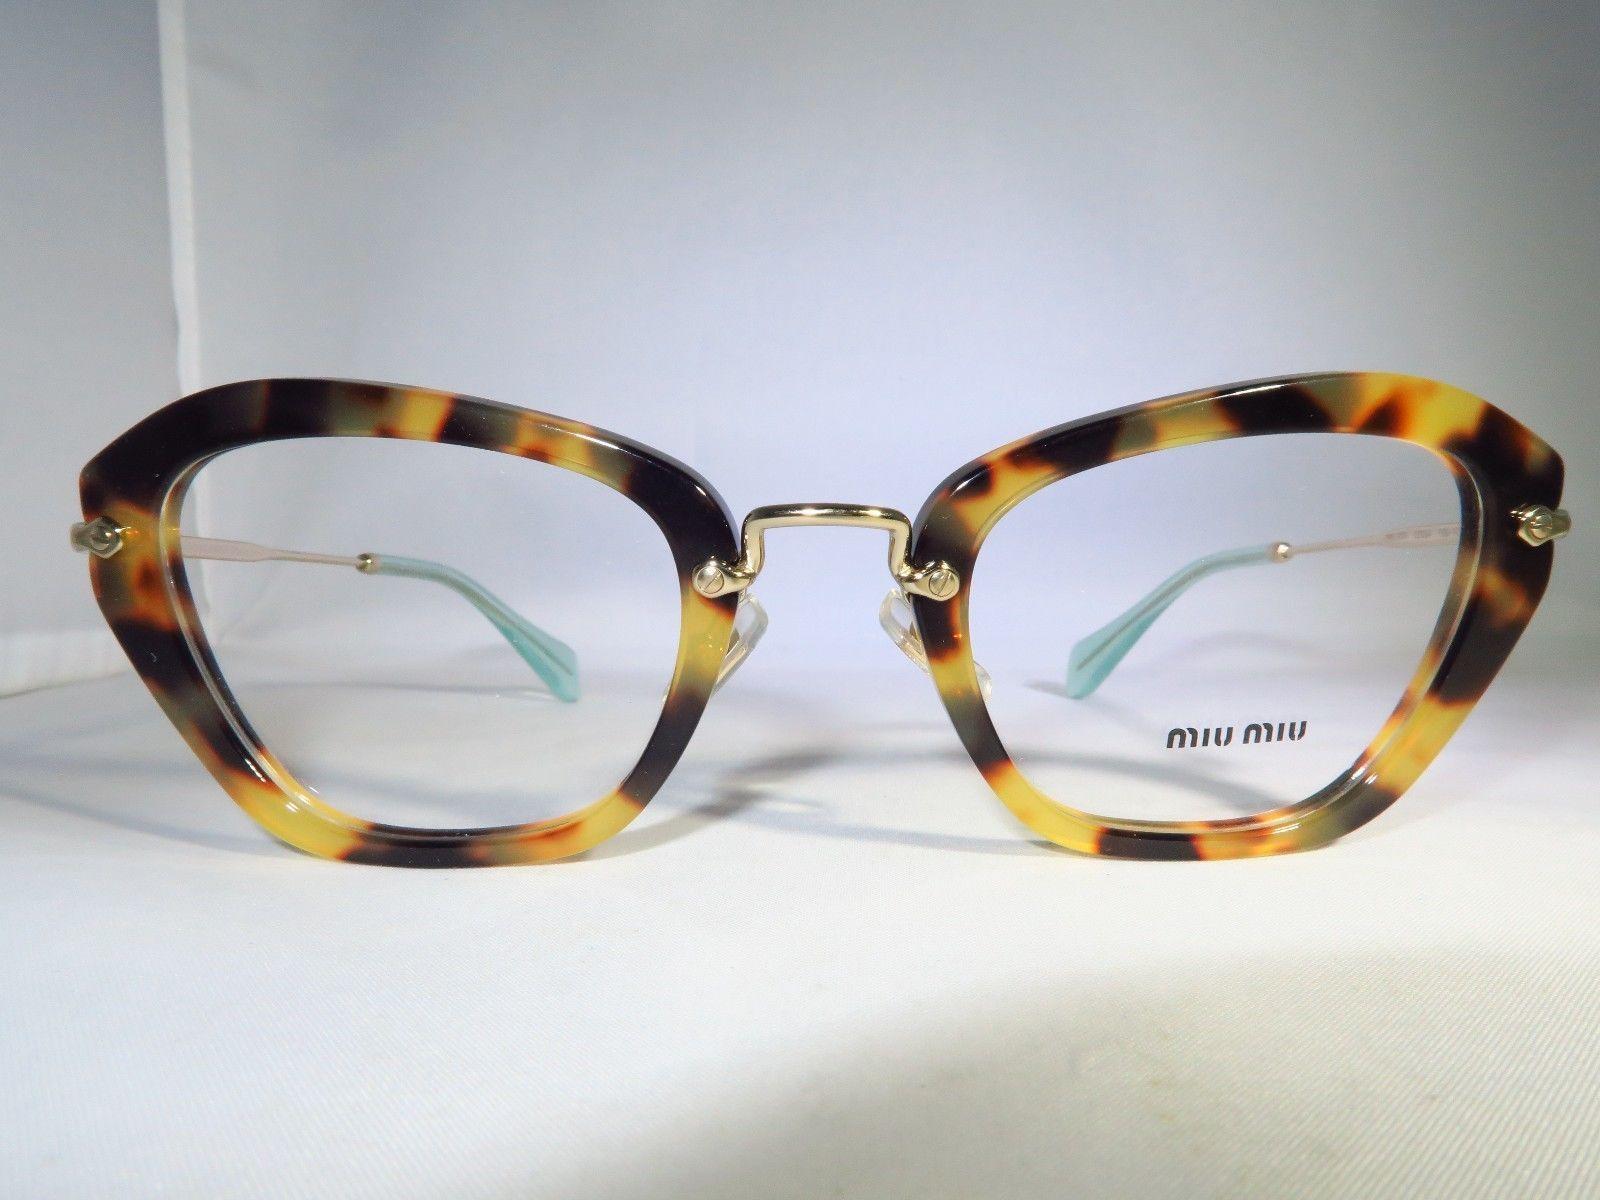 miu miu vmu 05n 7s0 1o1 spotted tortoise new women eyeglasses 50mm 24mm 140mm ebay - Ebay Glasses Frames